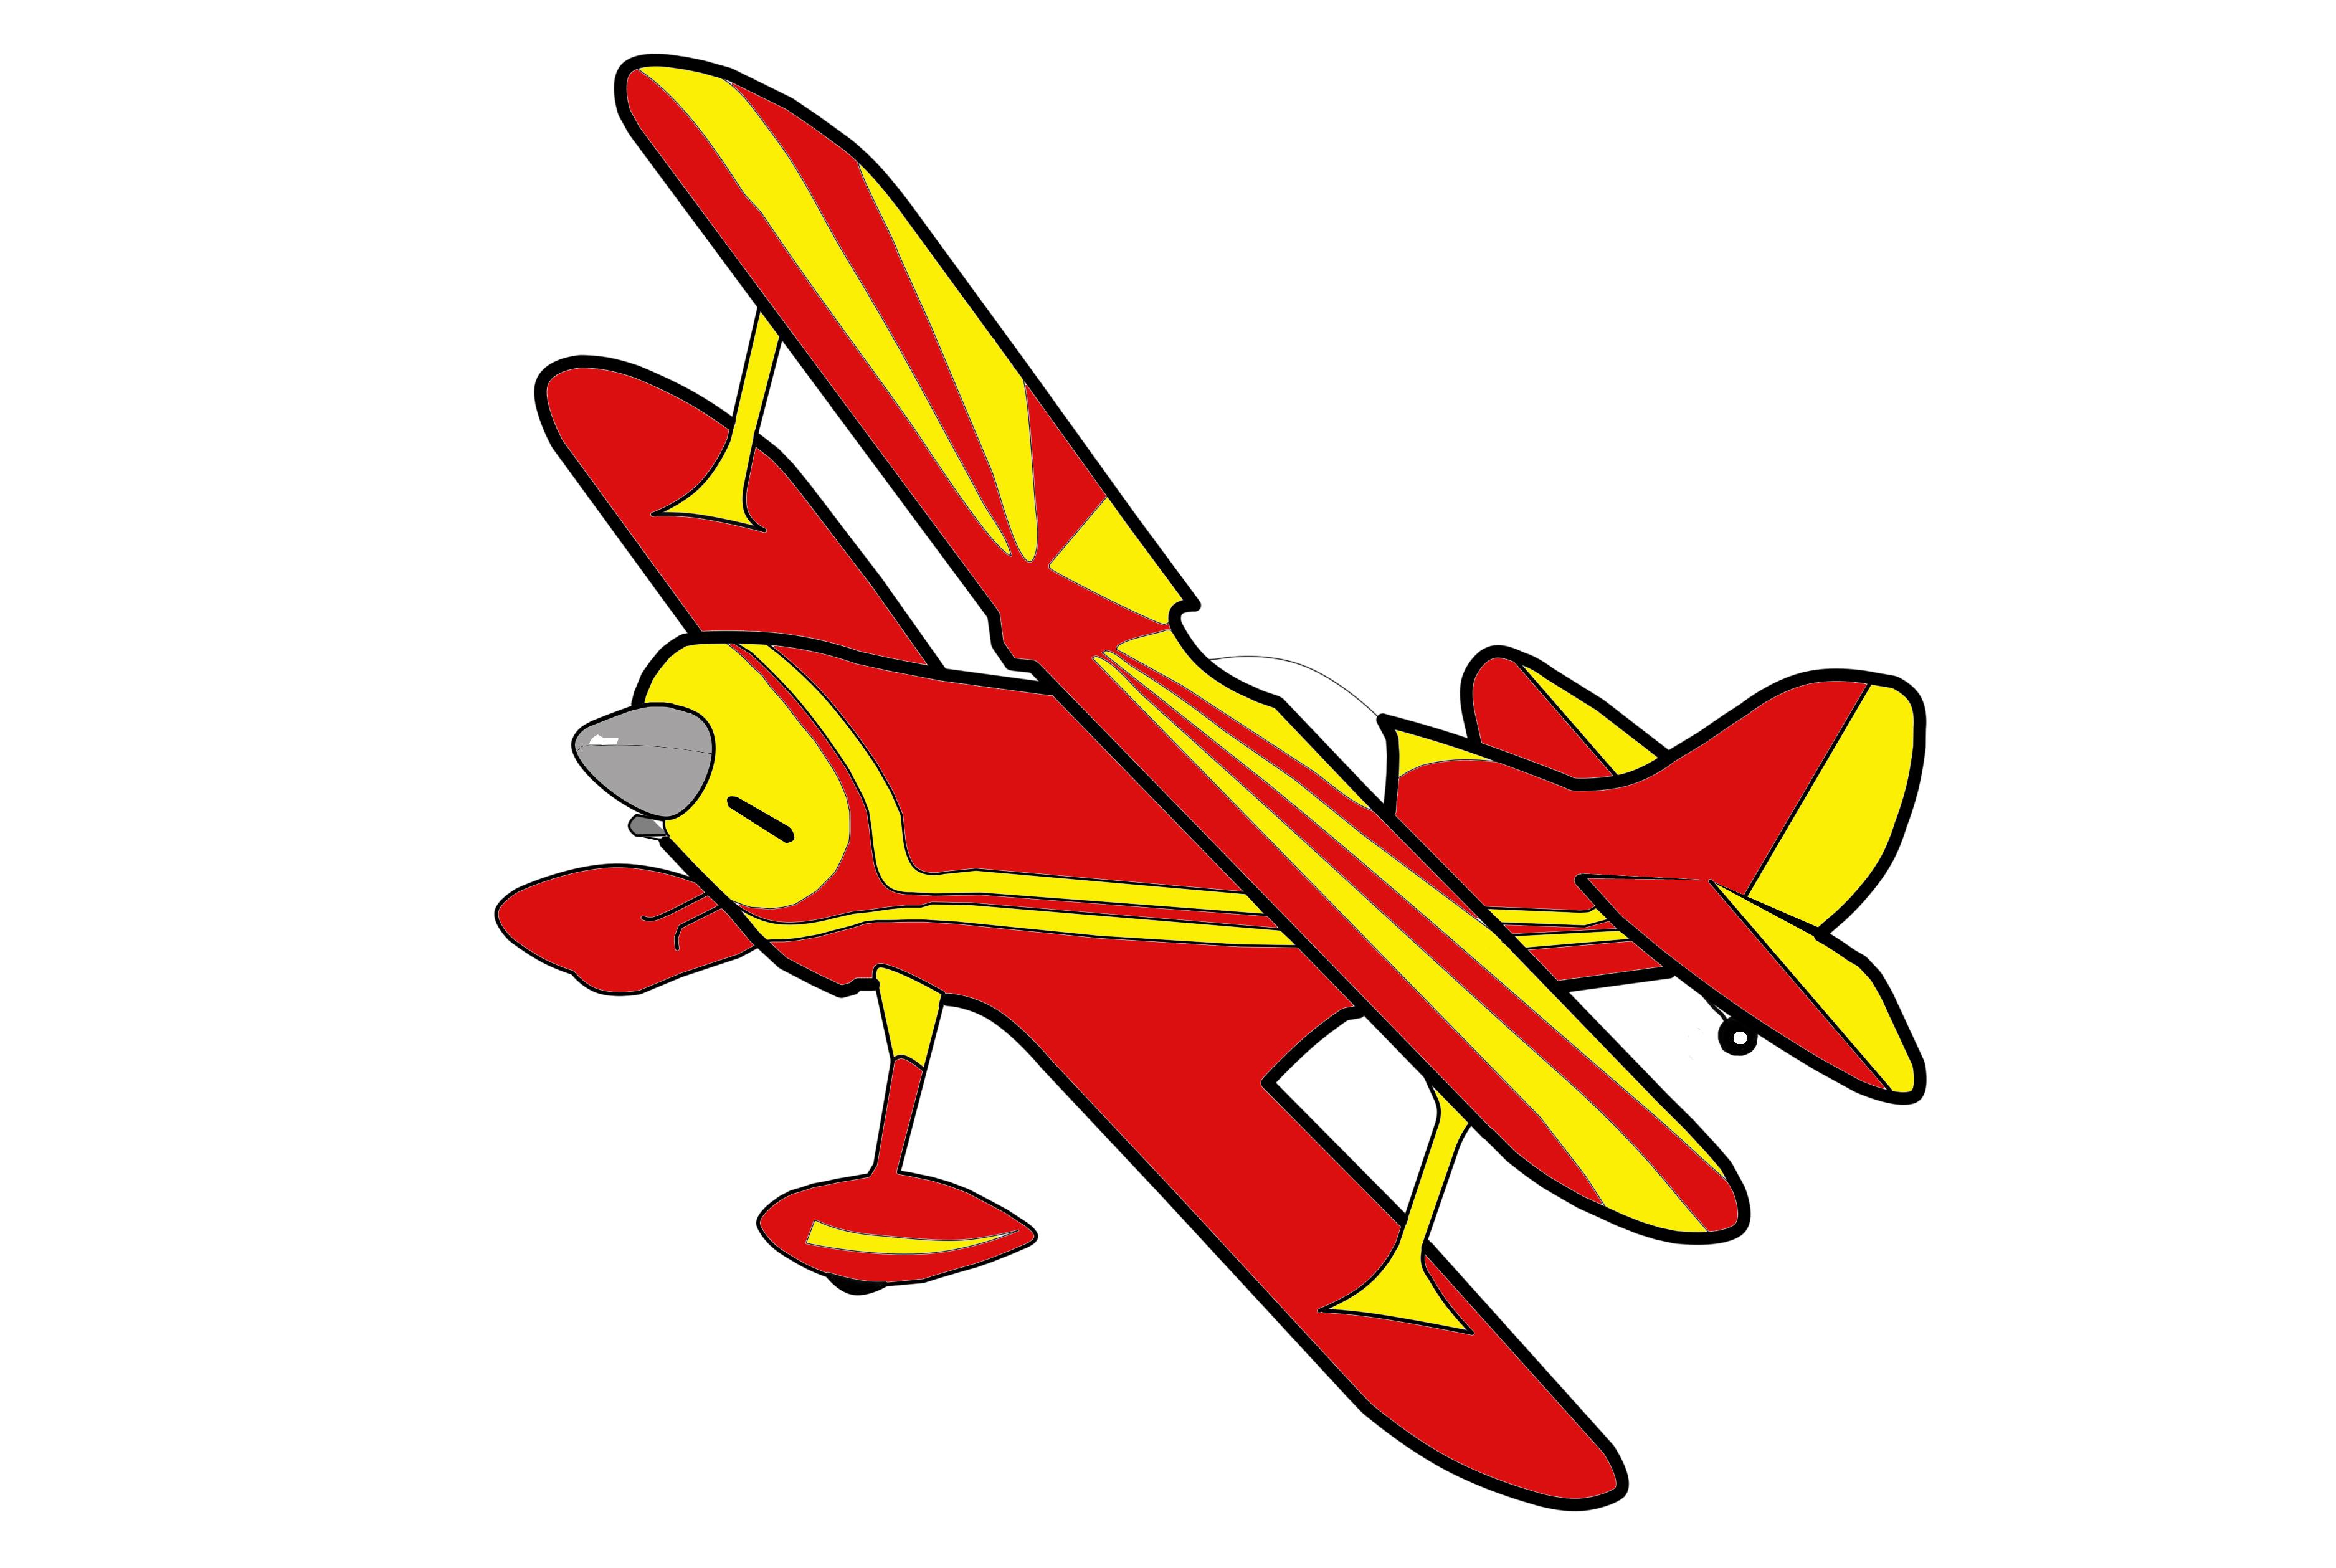 Biplane Clipart - Biplane Clipart